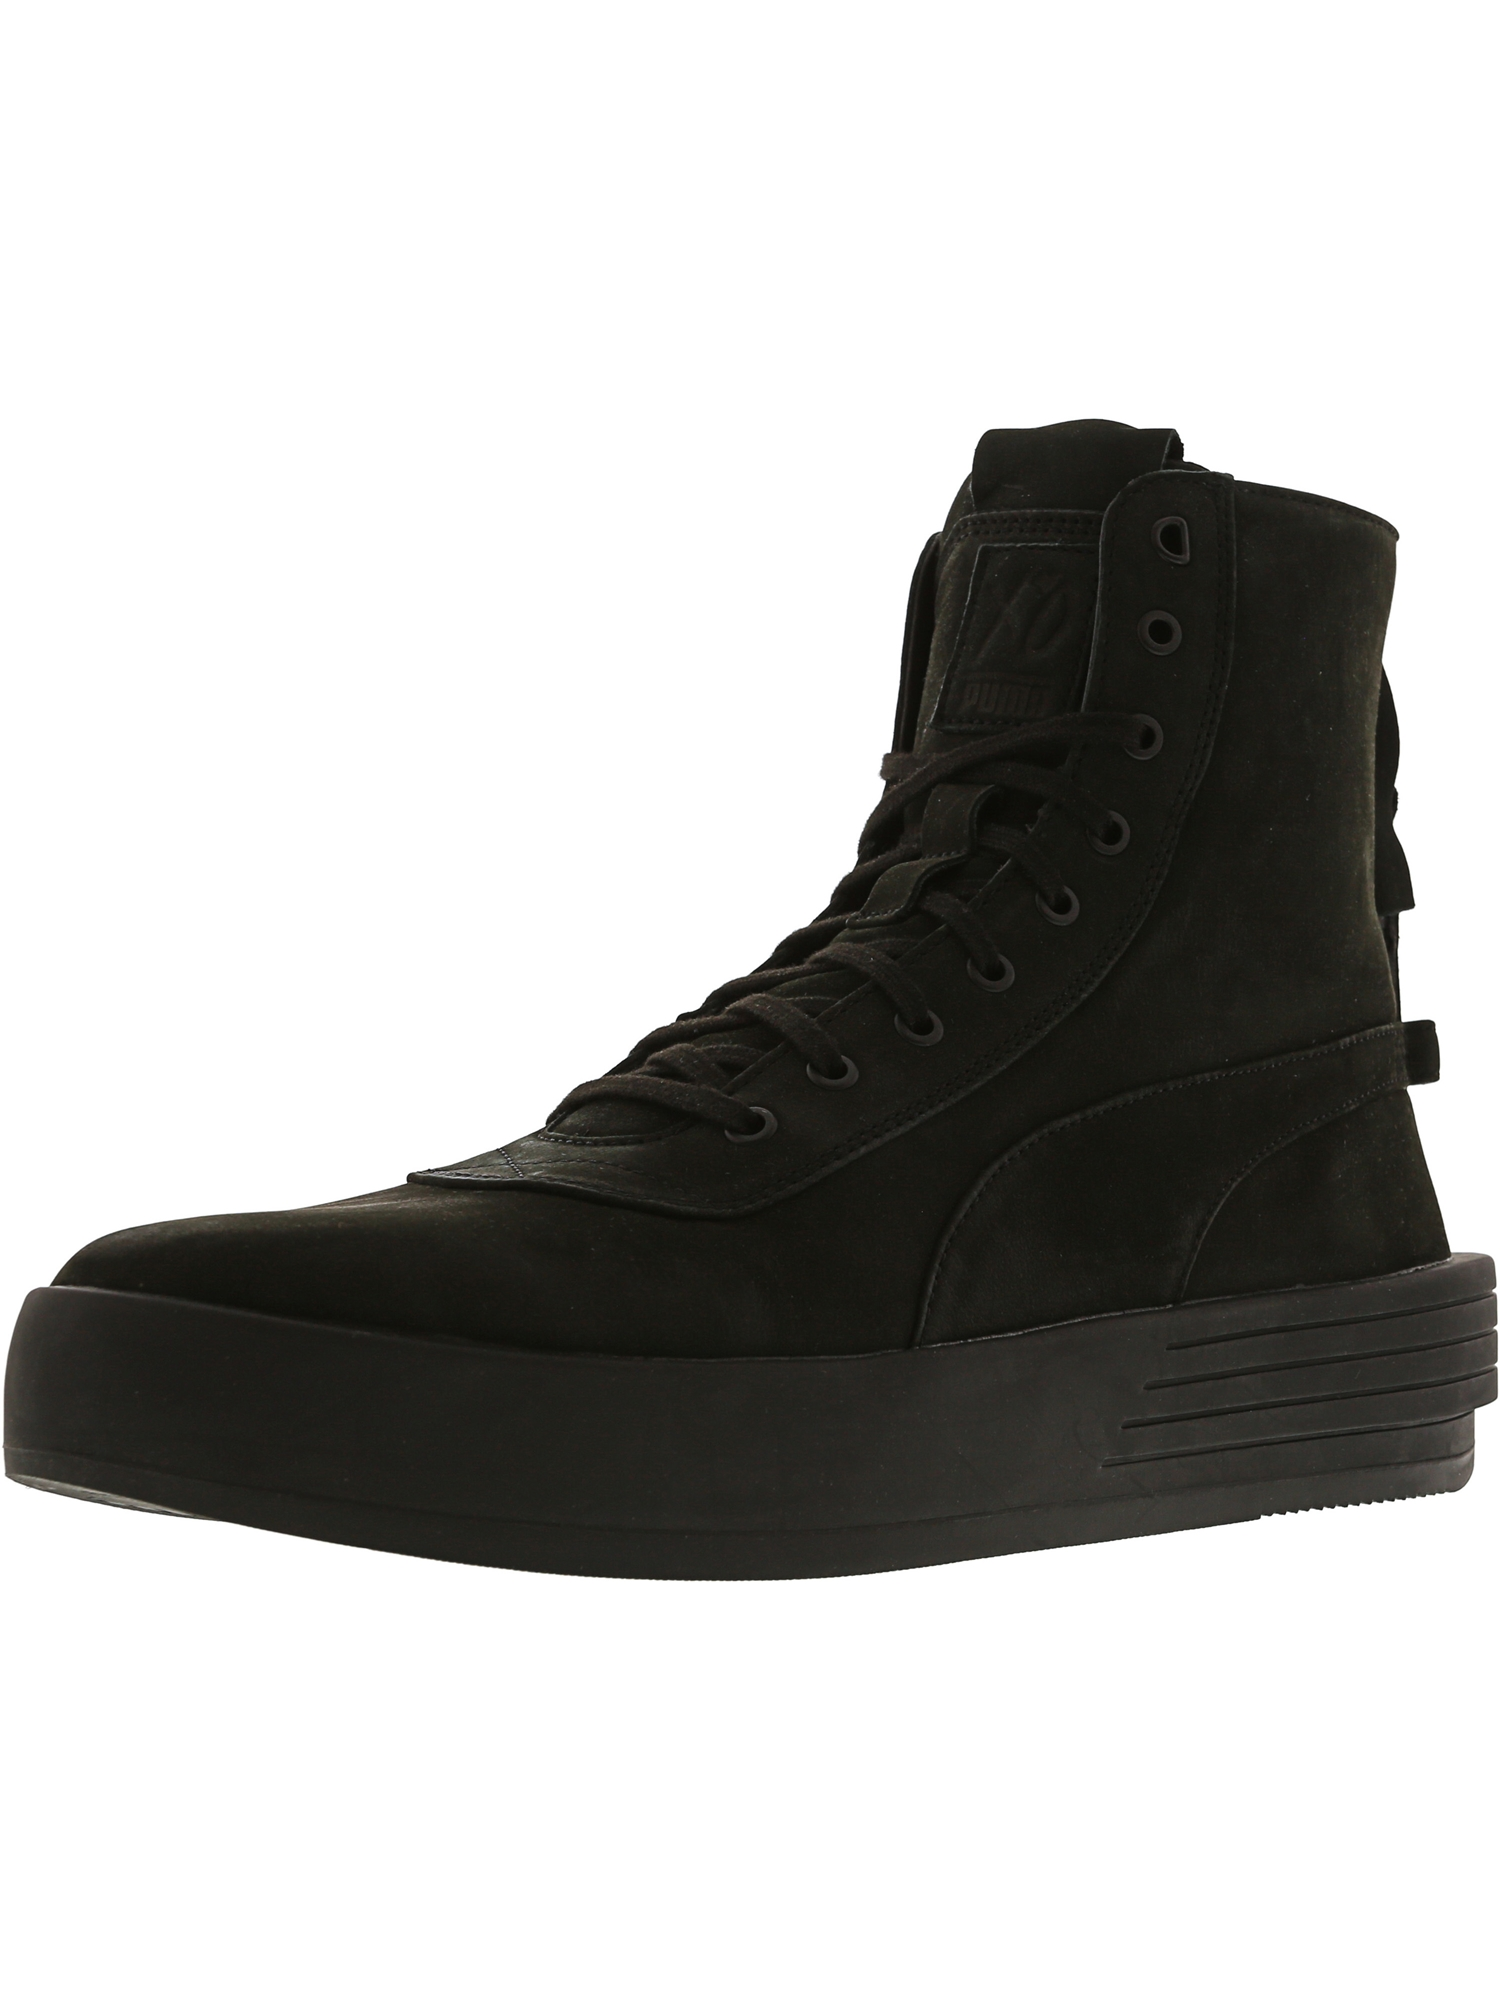 b2ef51f332a Puma Men s Xo Parallel Black   High-Top Leather Fashion Sneaker - 9M ...